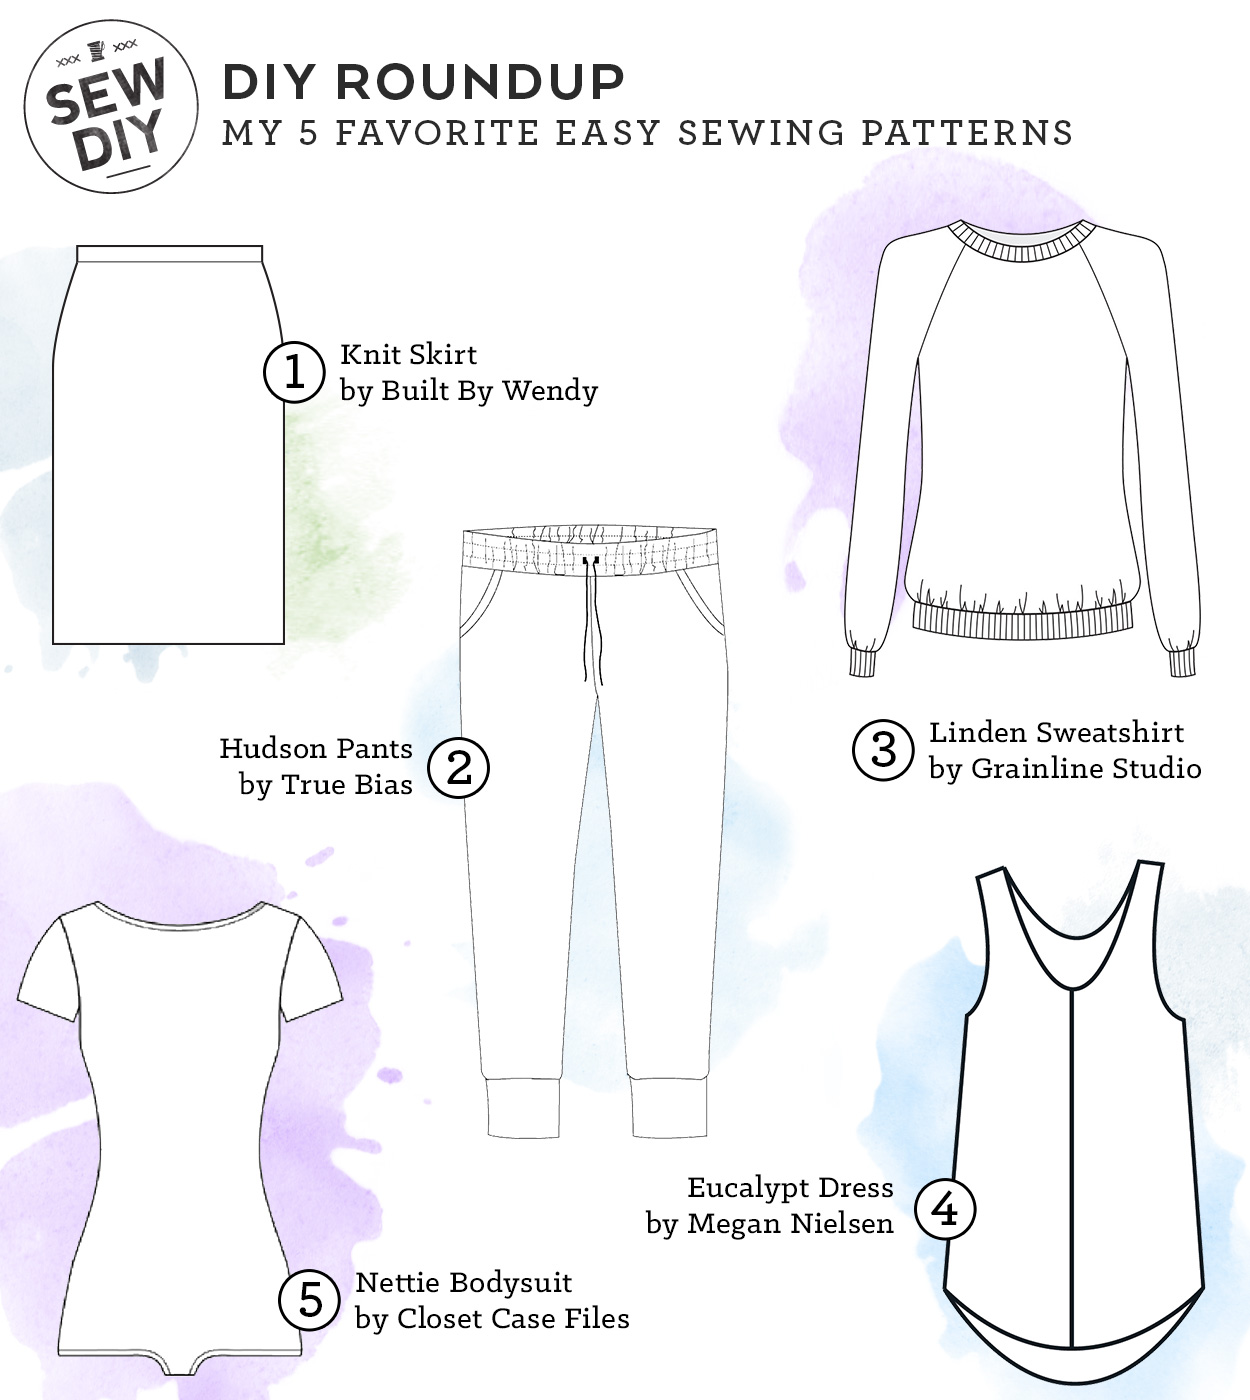 Top 5 Easy Sewing Patterns | Sew DIY